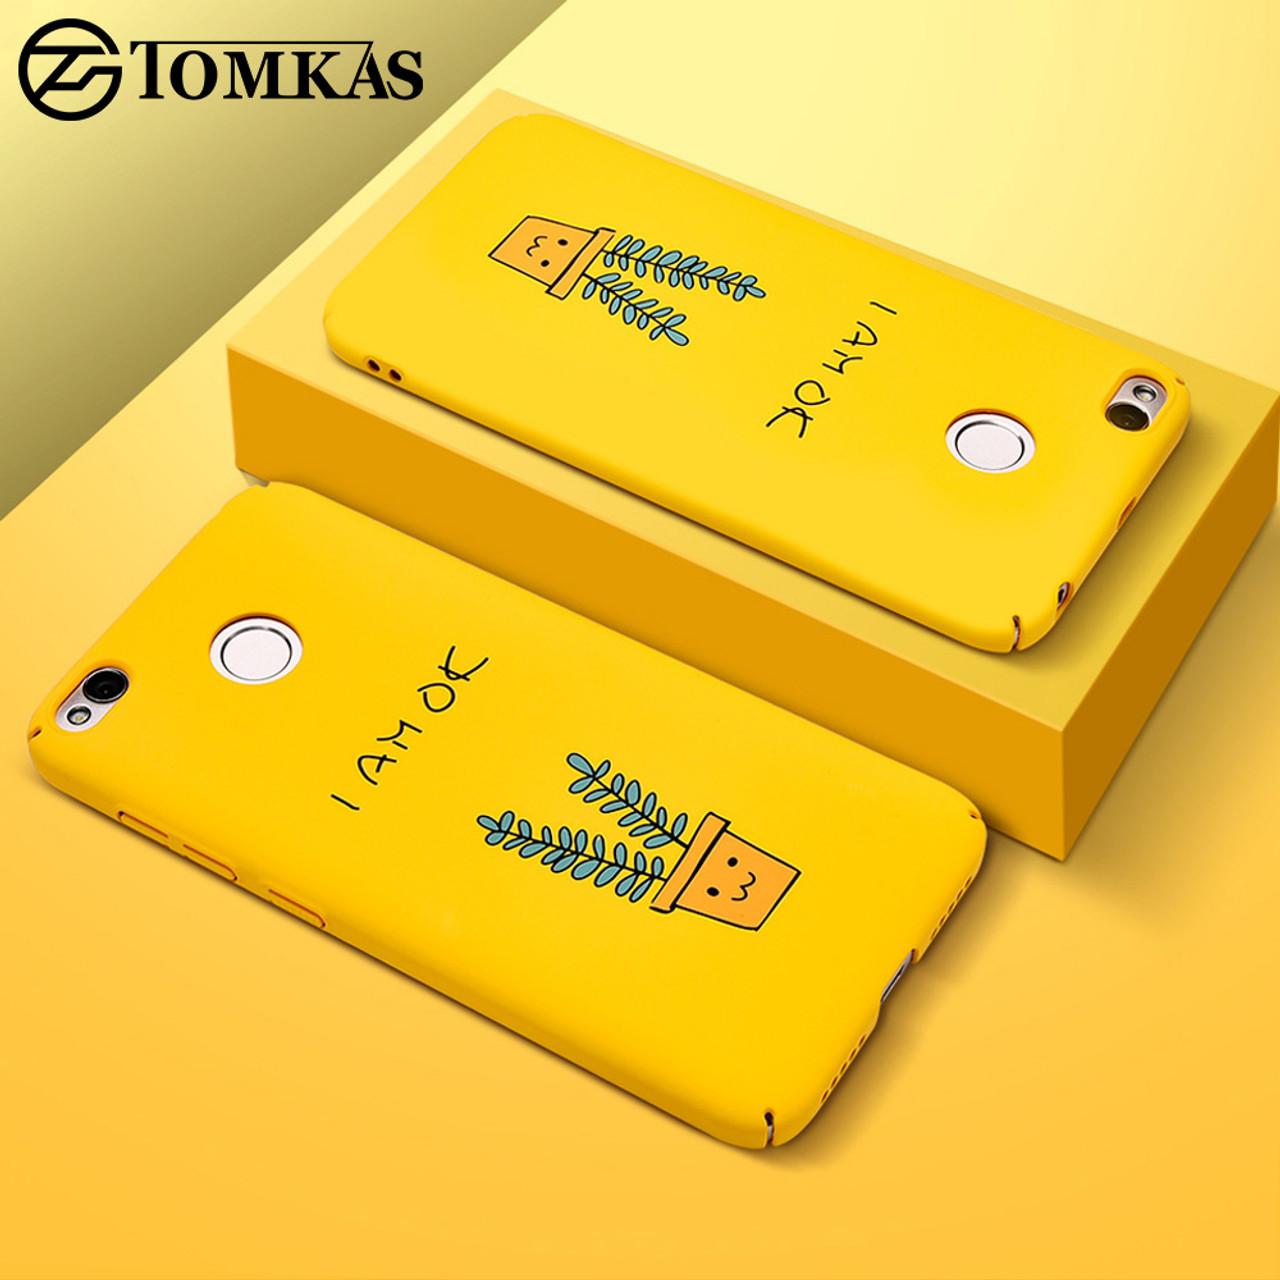 best sneakers 5dfb9 0a04b TOMKAS Cute PC Case For Xiaomi Redmi 4X Note 4X 32 GB Mi A1 Cases Cover  Back Patterned Case For Xiaomi Redmi 4X 5.0 Inch